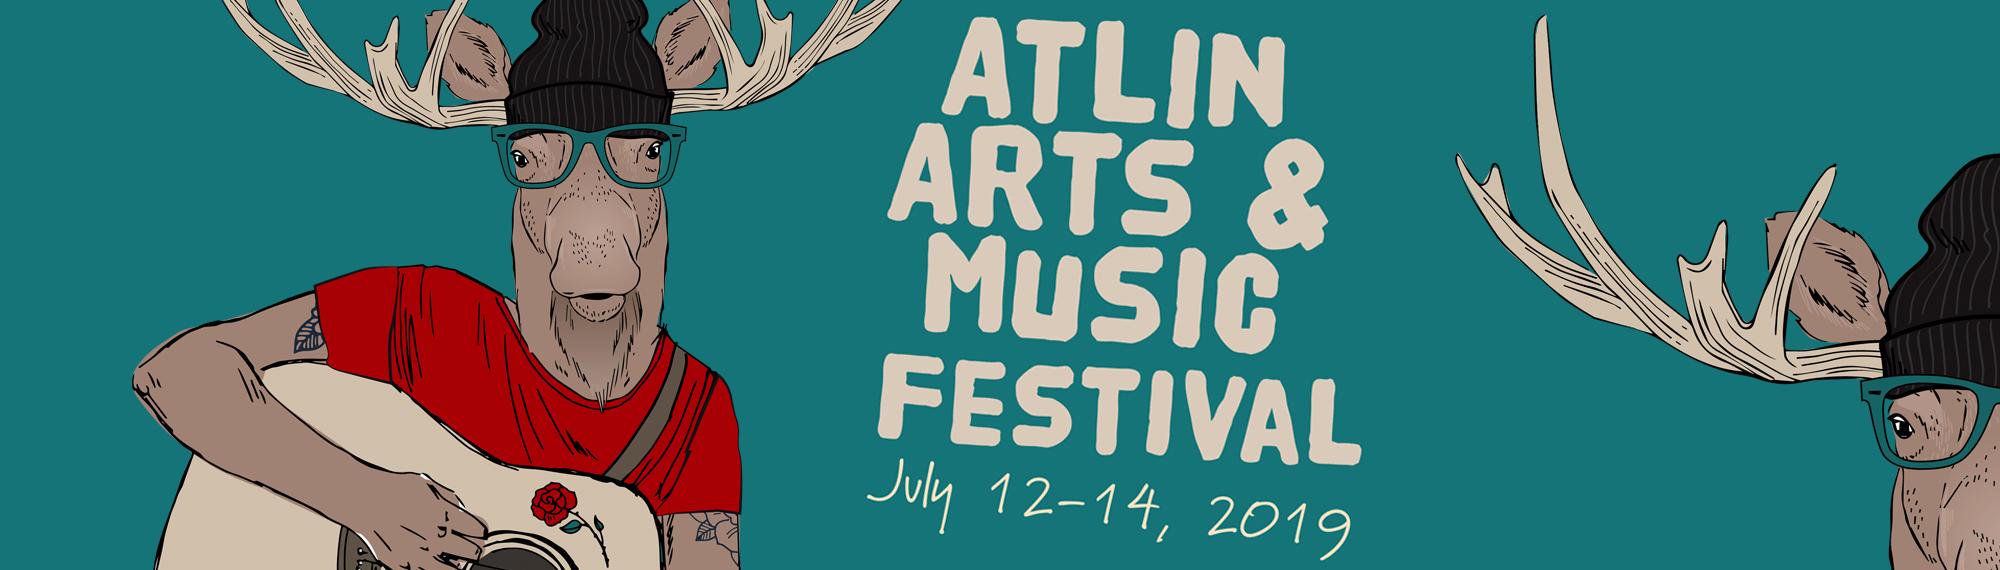 Atlin Arts and Music Festival